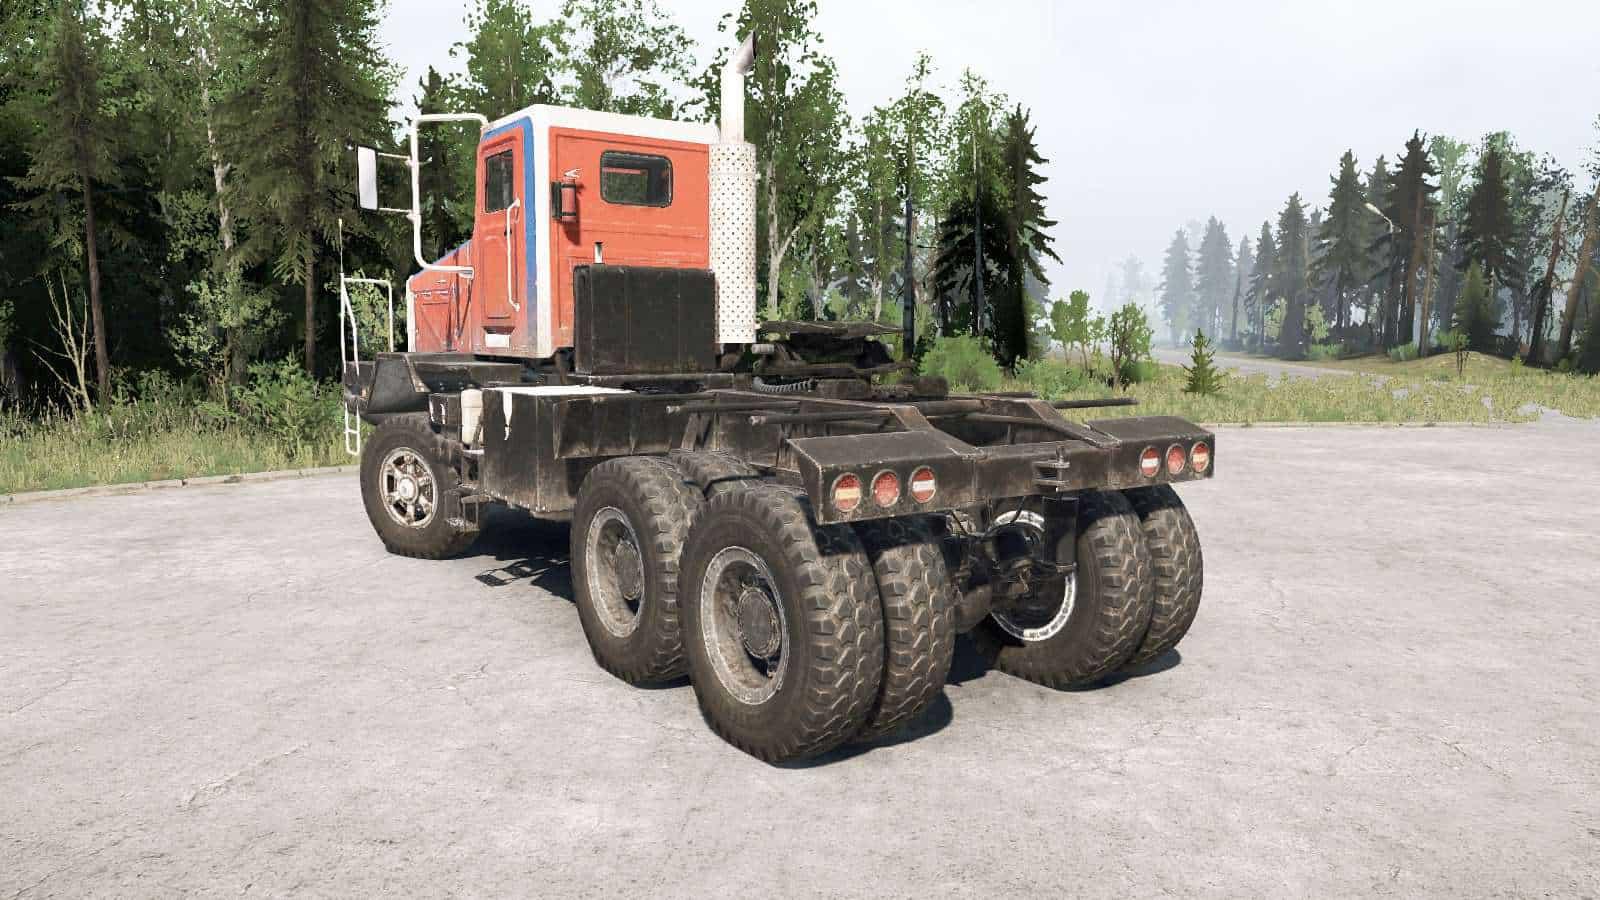 Spintires:Mudrunner - Boar 45318 Truck